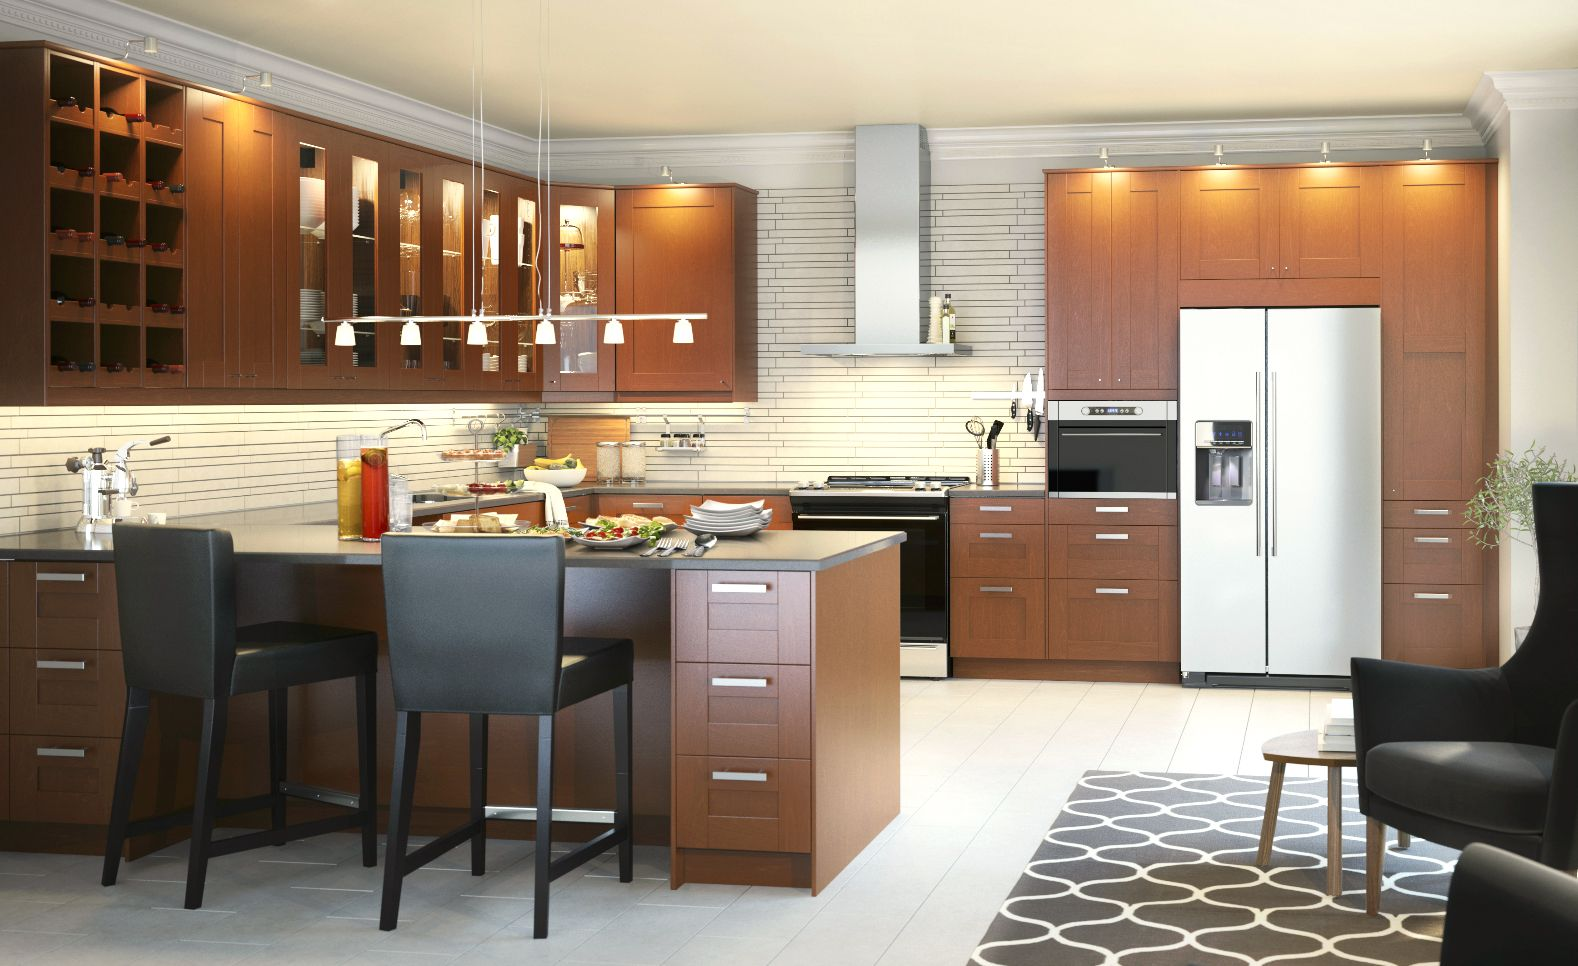 The SEKTION Kitchen With GRIMSLOV Medium Brown Doors Has